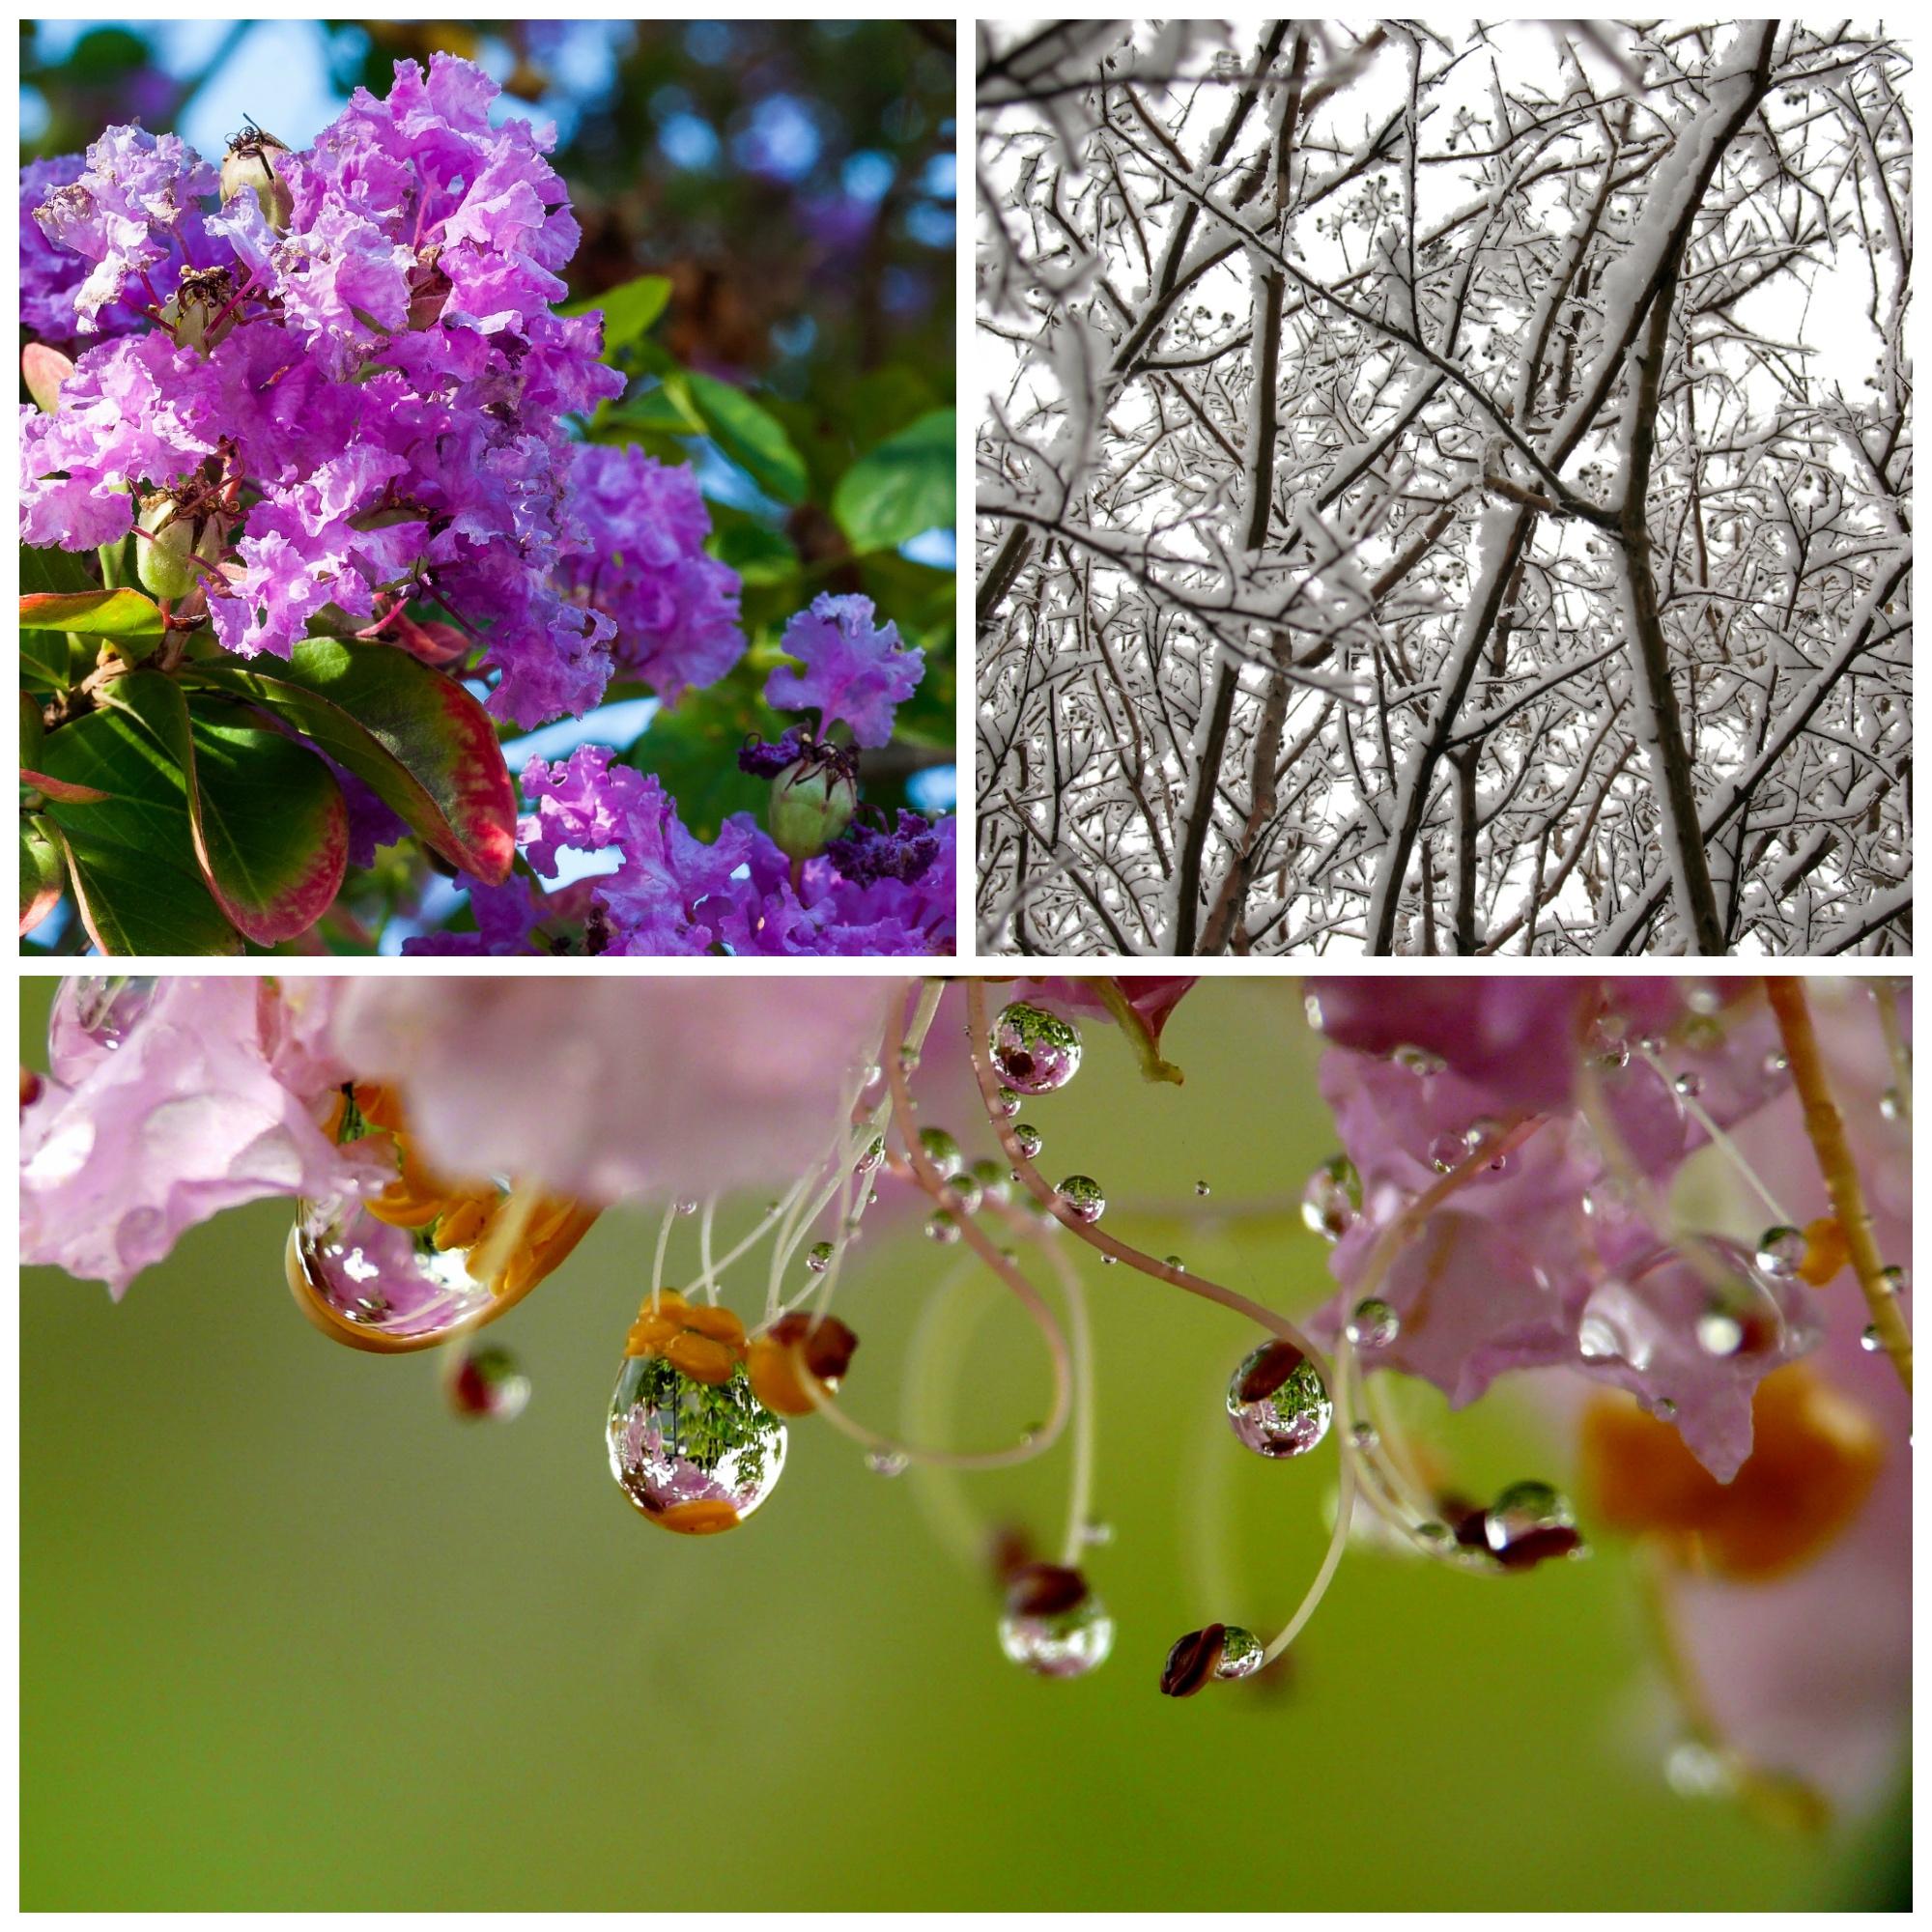 Top Left © Shelia Sund, Top Right © psionicman, Bottom photo © ConiferConifer, Creative Commons